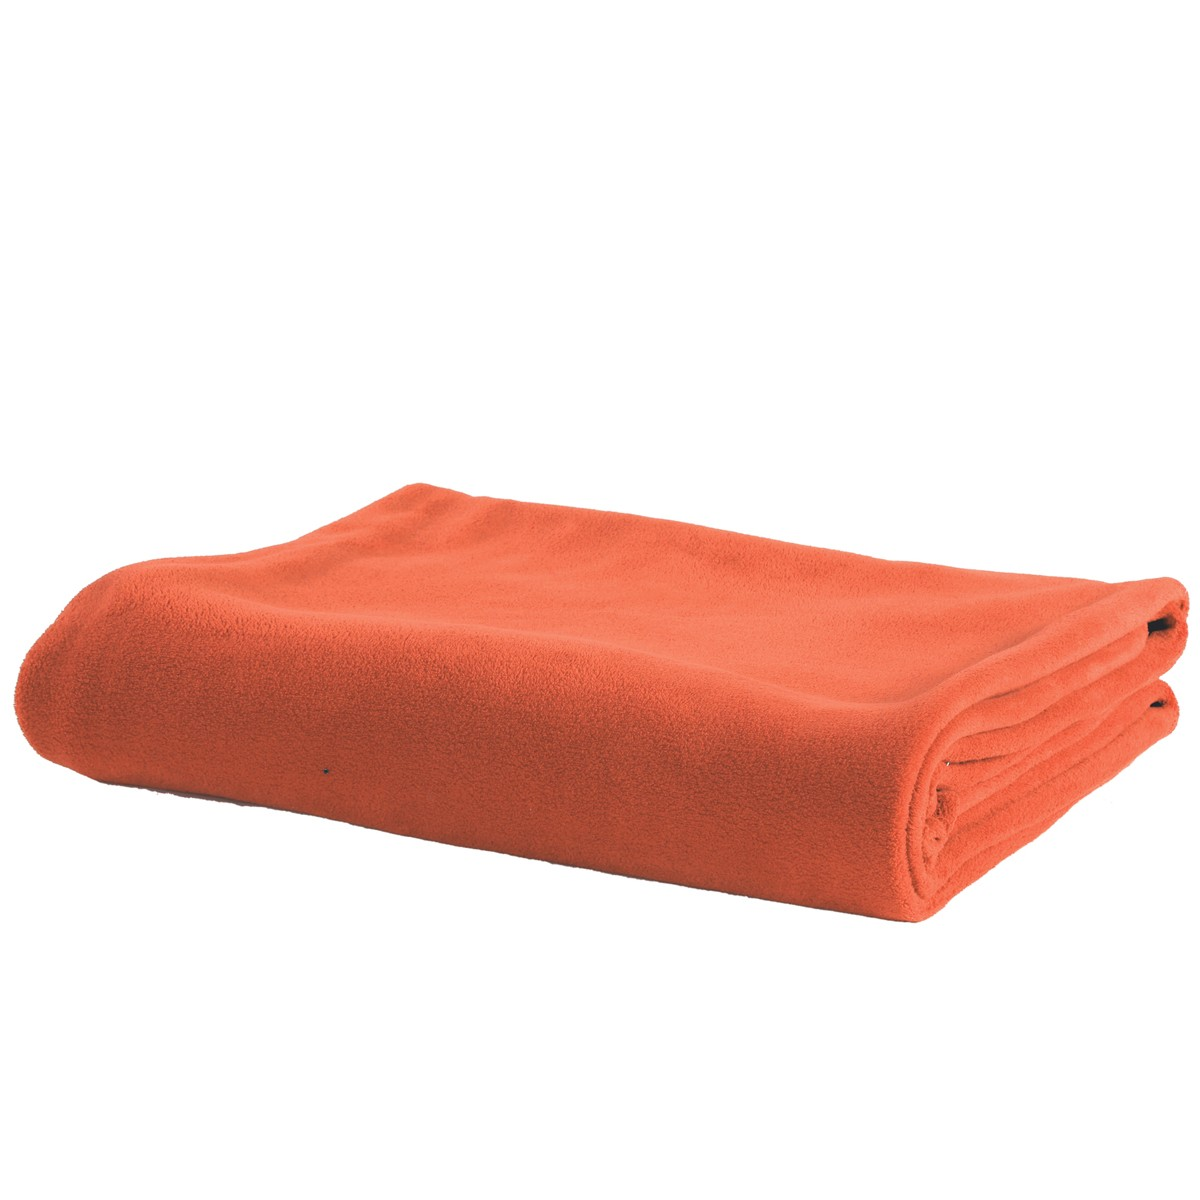 Fleece nef nef planet orange for Plante orange